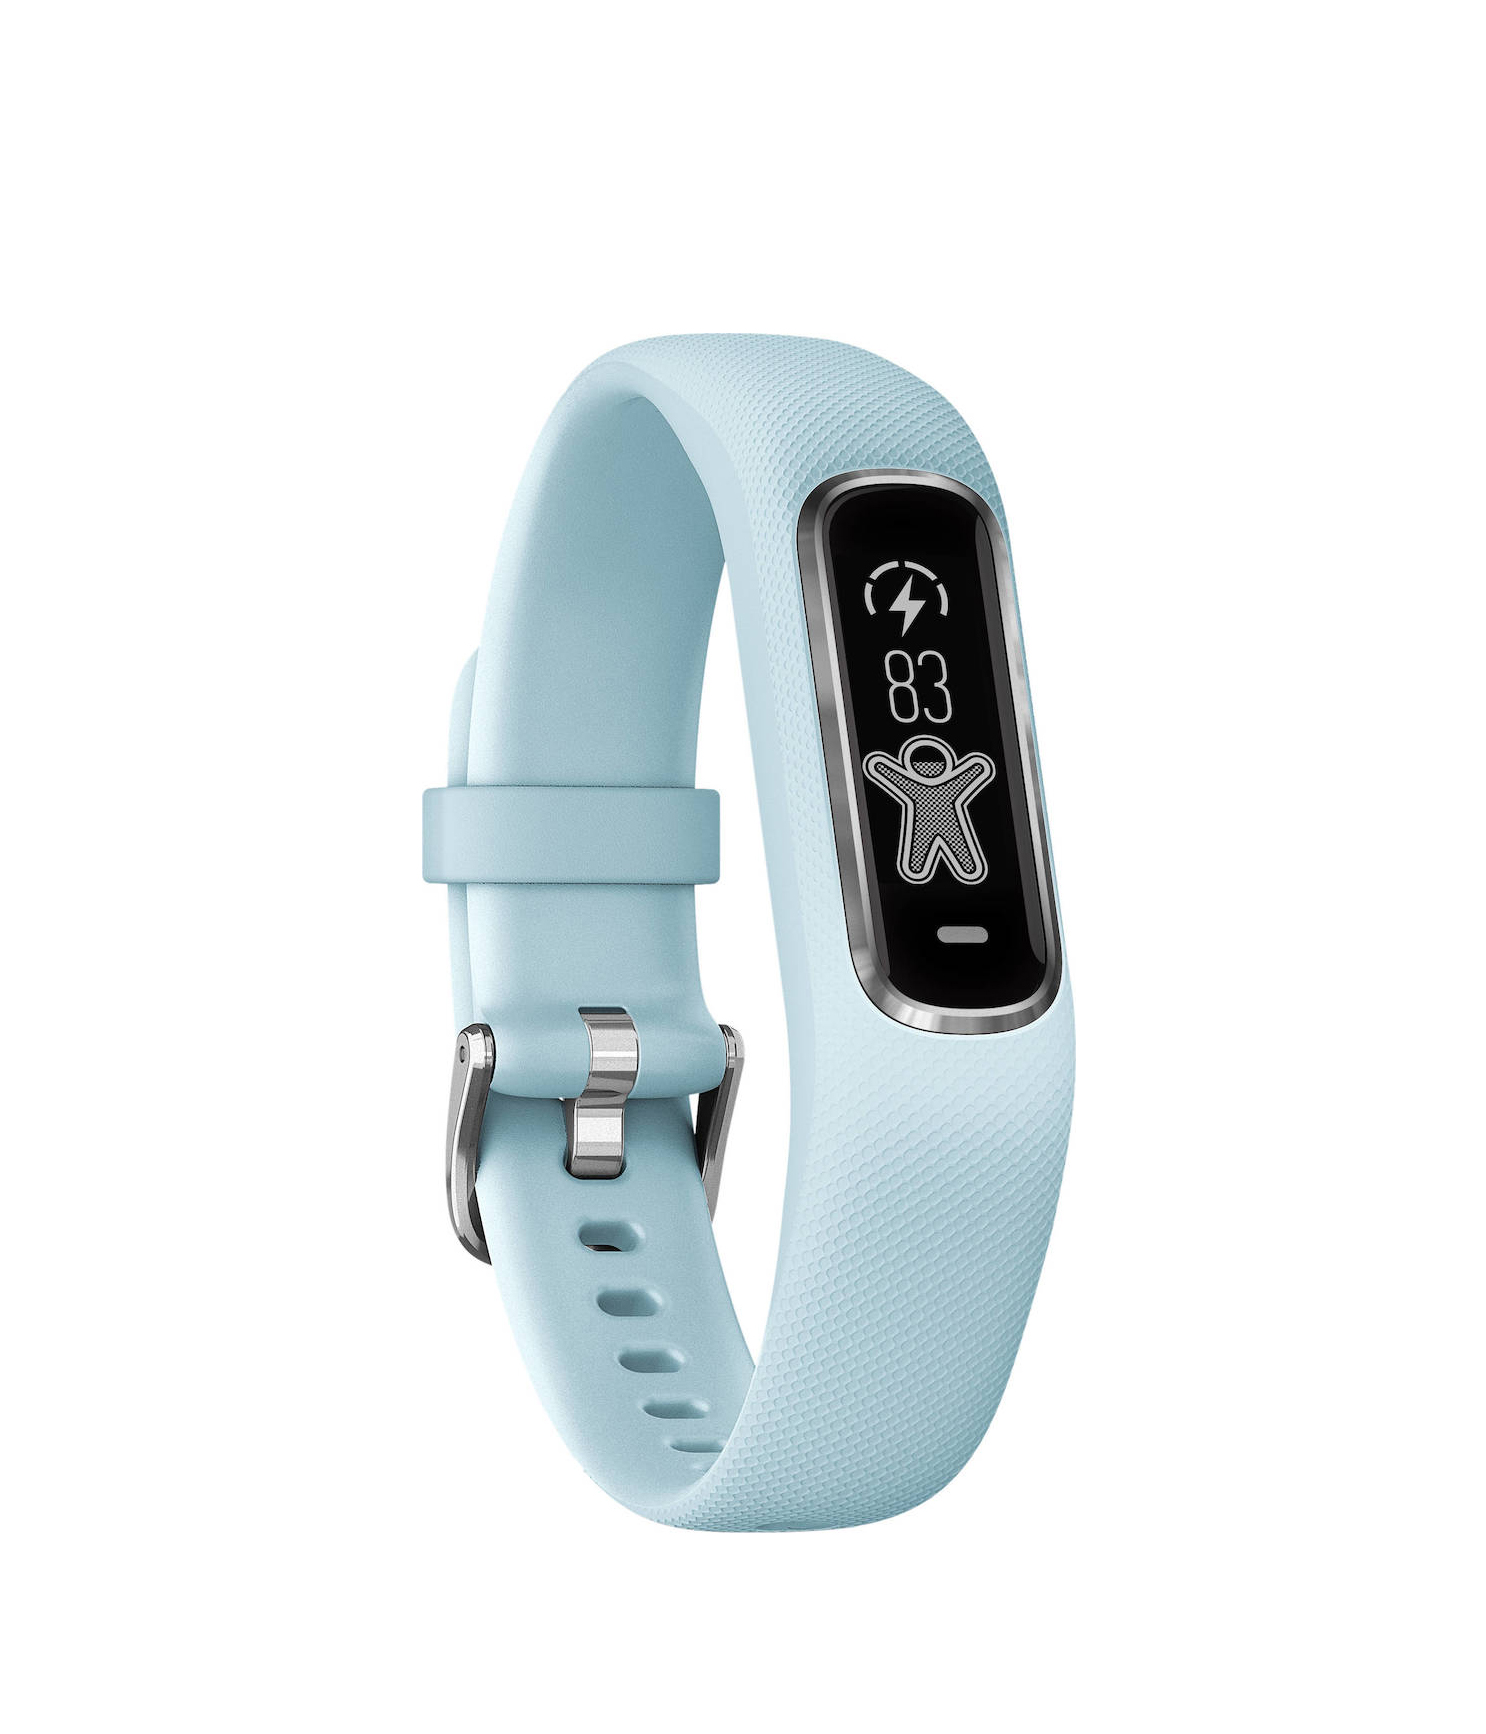 Garmin Vivosmart 4 S/M Azure Blue/Silver